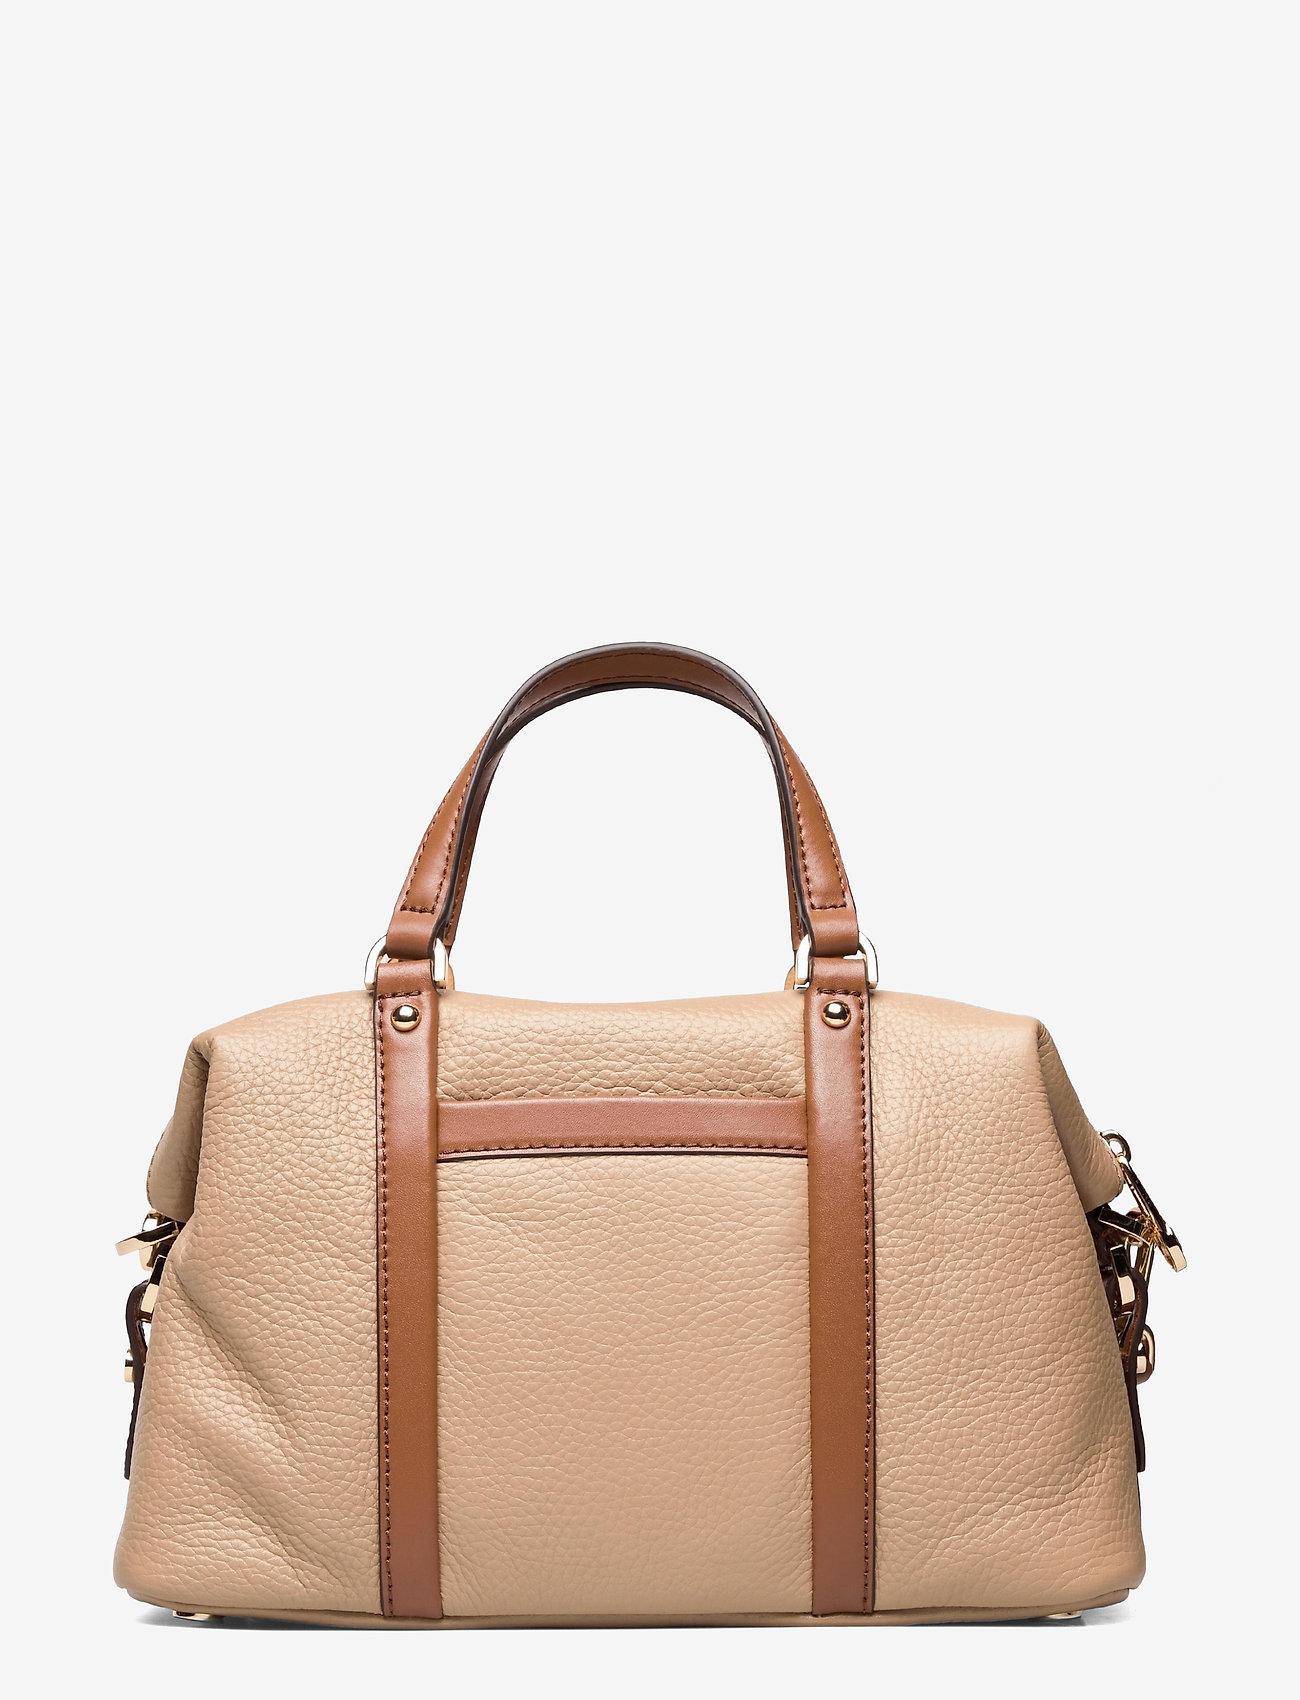 Michael Kors - SM SATCHEL - shoulder bags - camel multi - 1